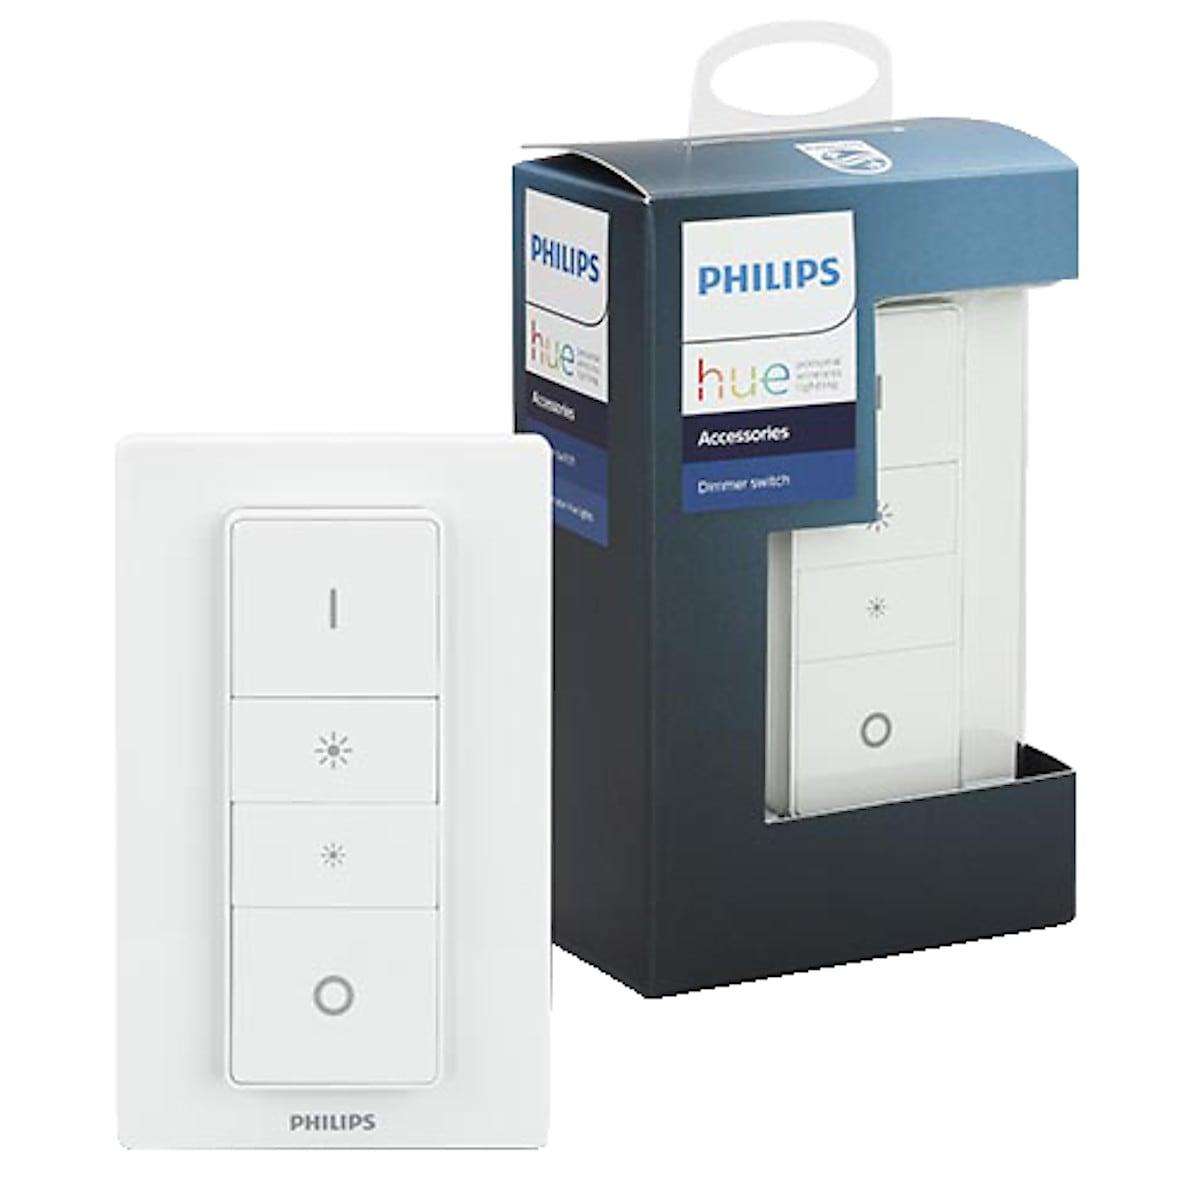 Philips Hue Dim trådløs dimmer med fjernkontroll